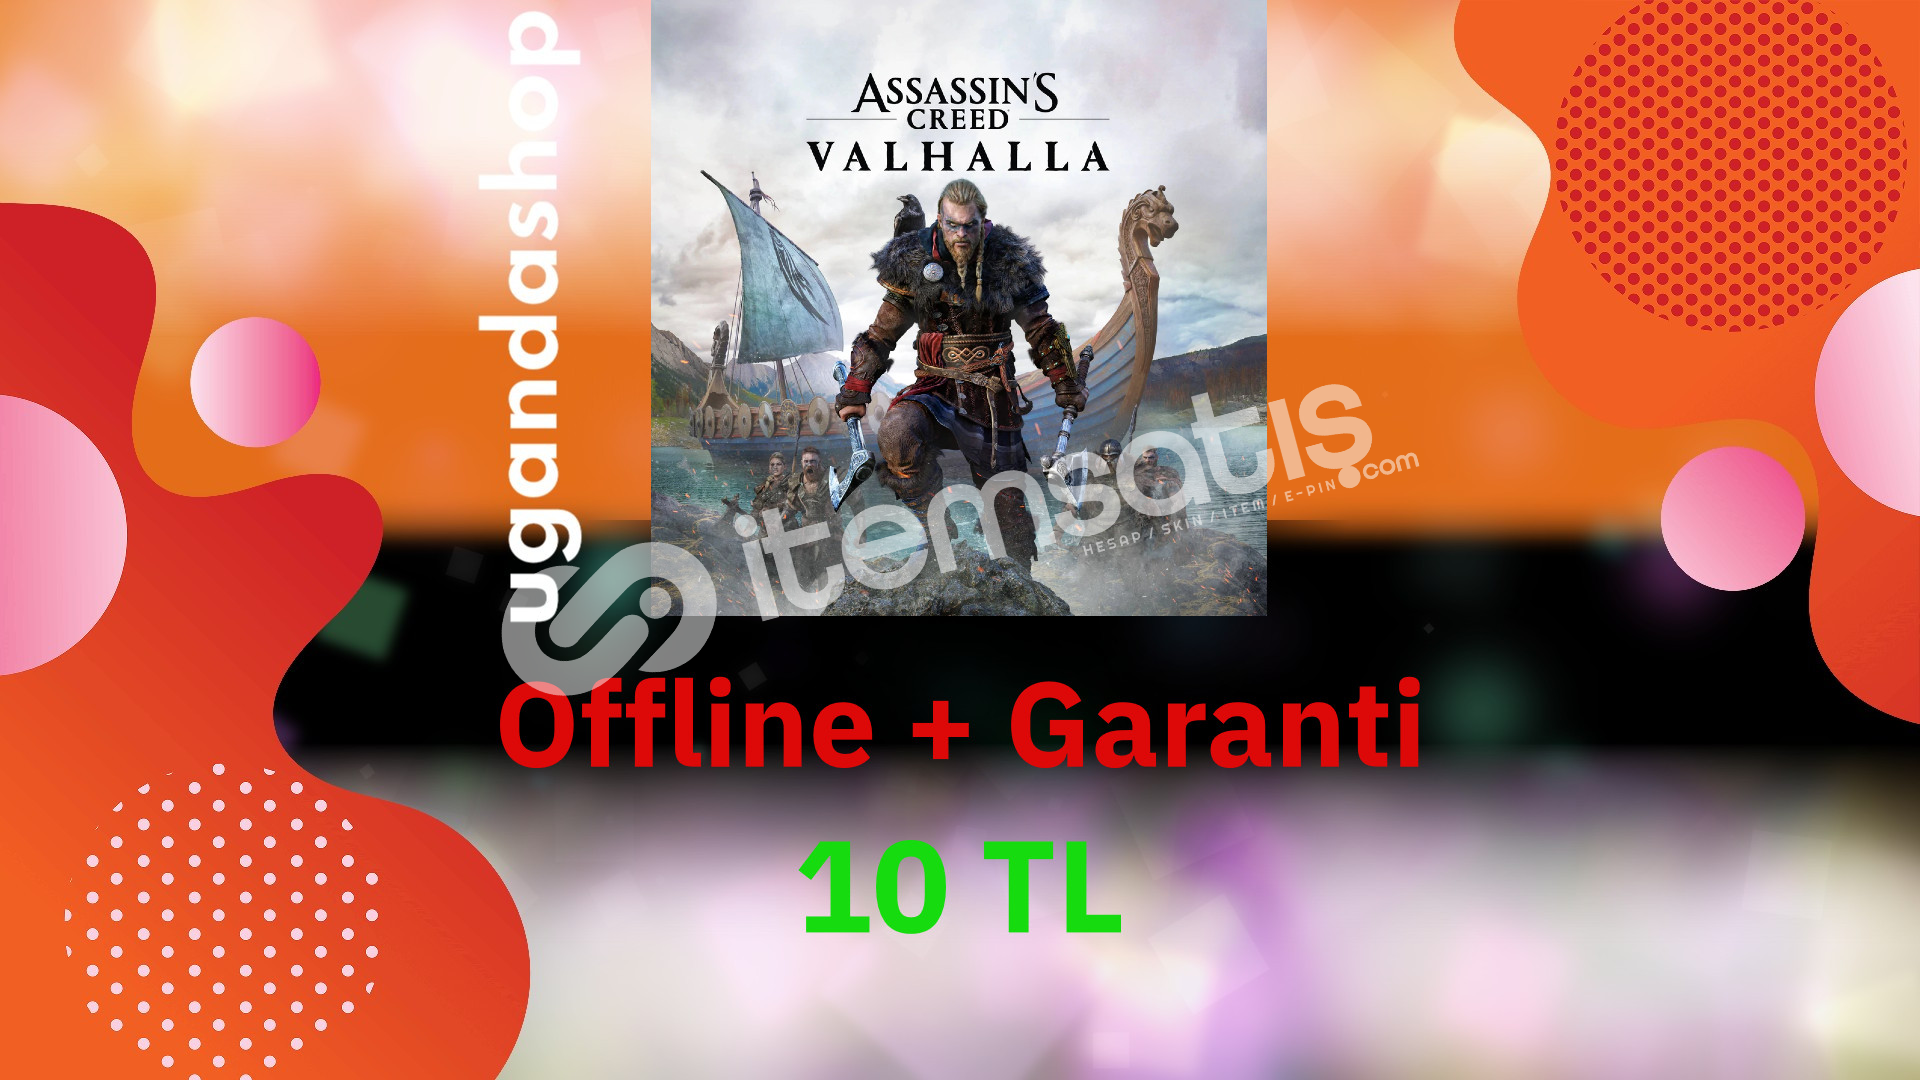 Assassin's Creed Valhalla Offline Ubisoft Hesap